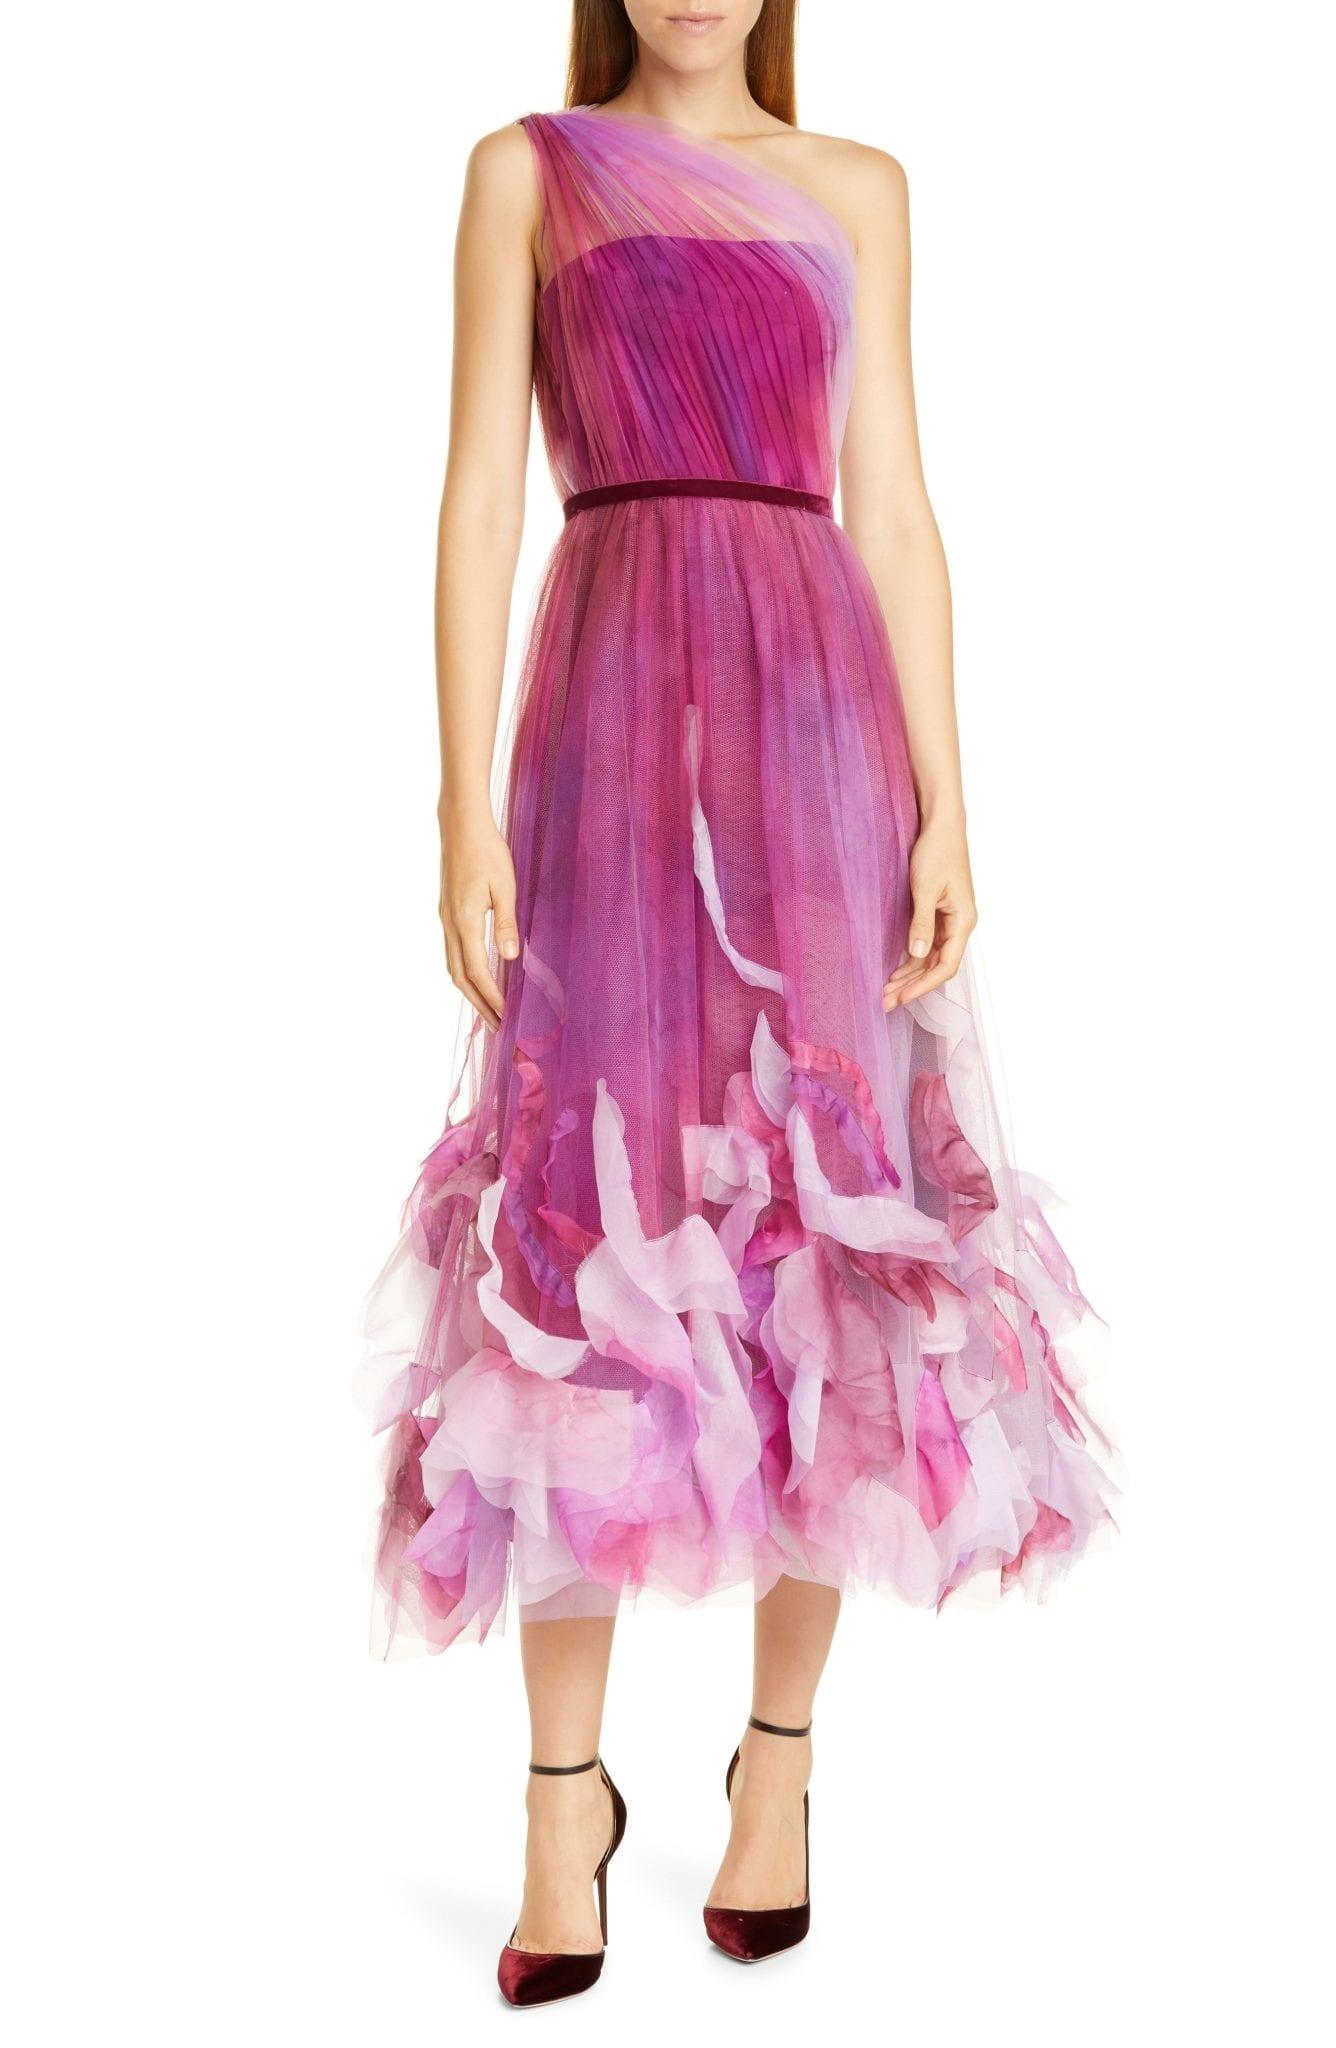 MARCHESA NOTTE One-Shoulder Tulle Cocktail Dress